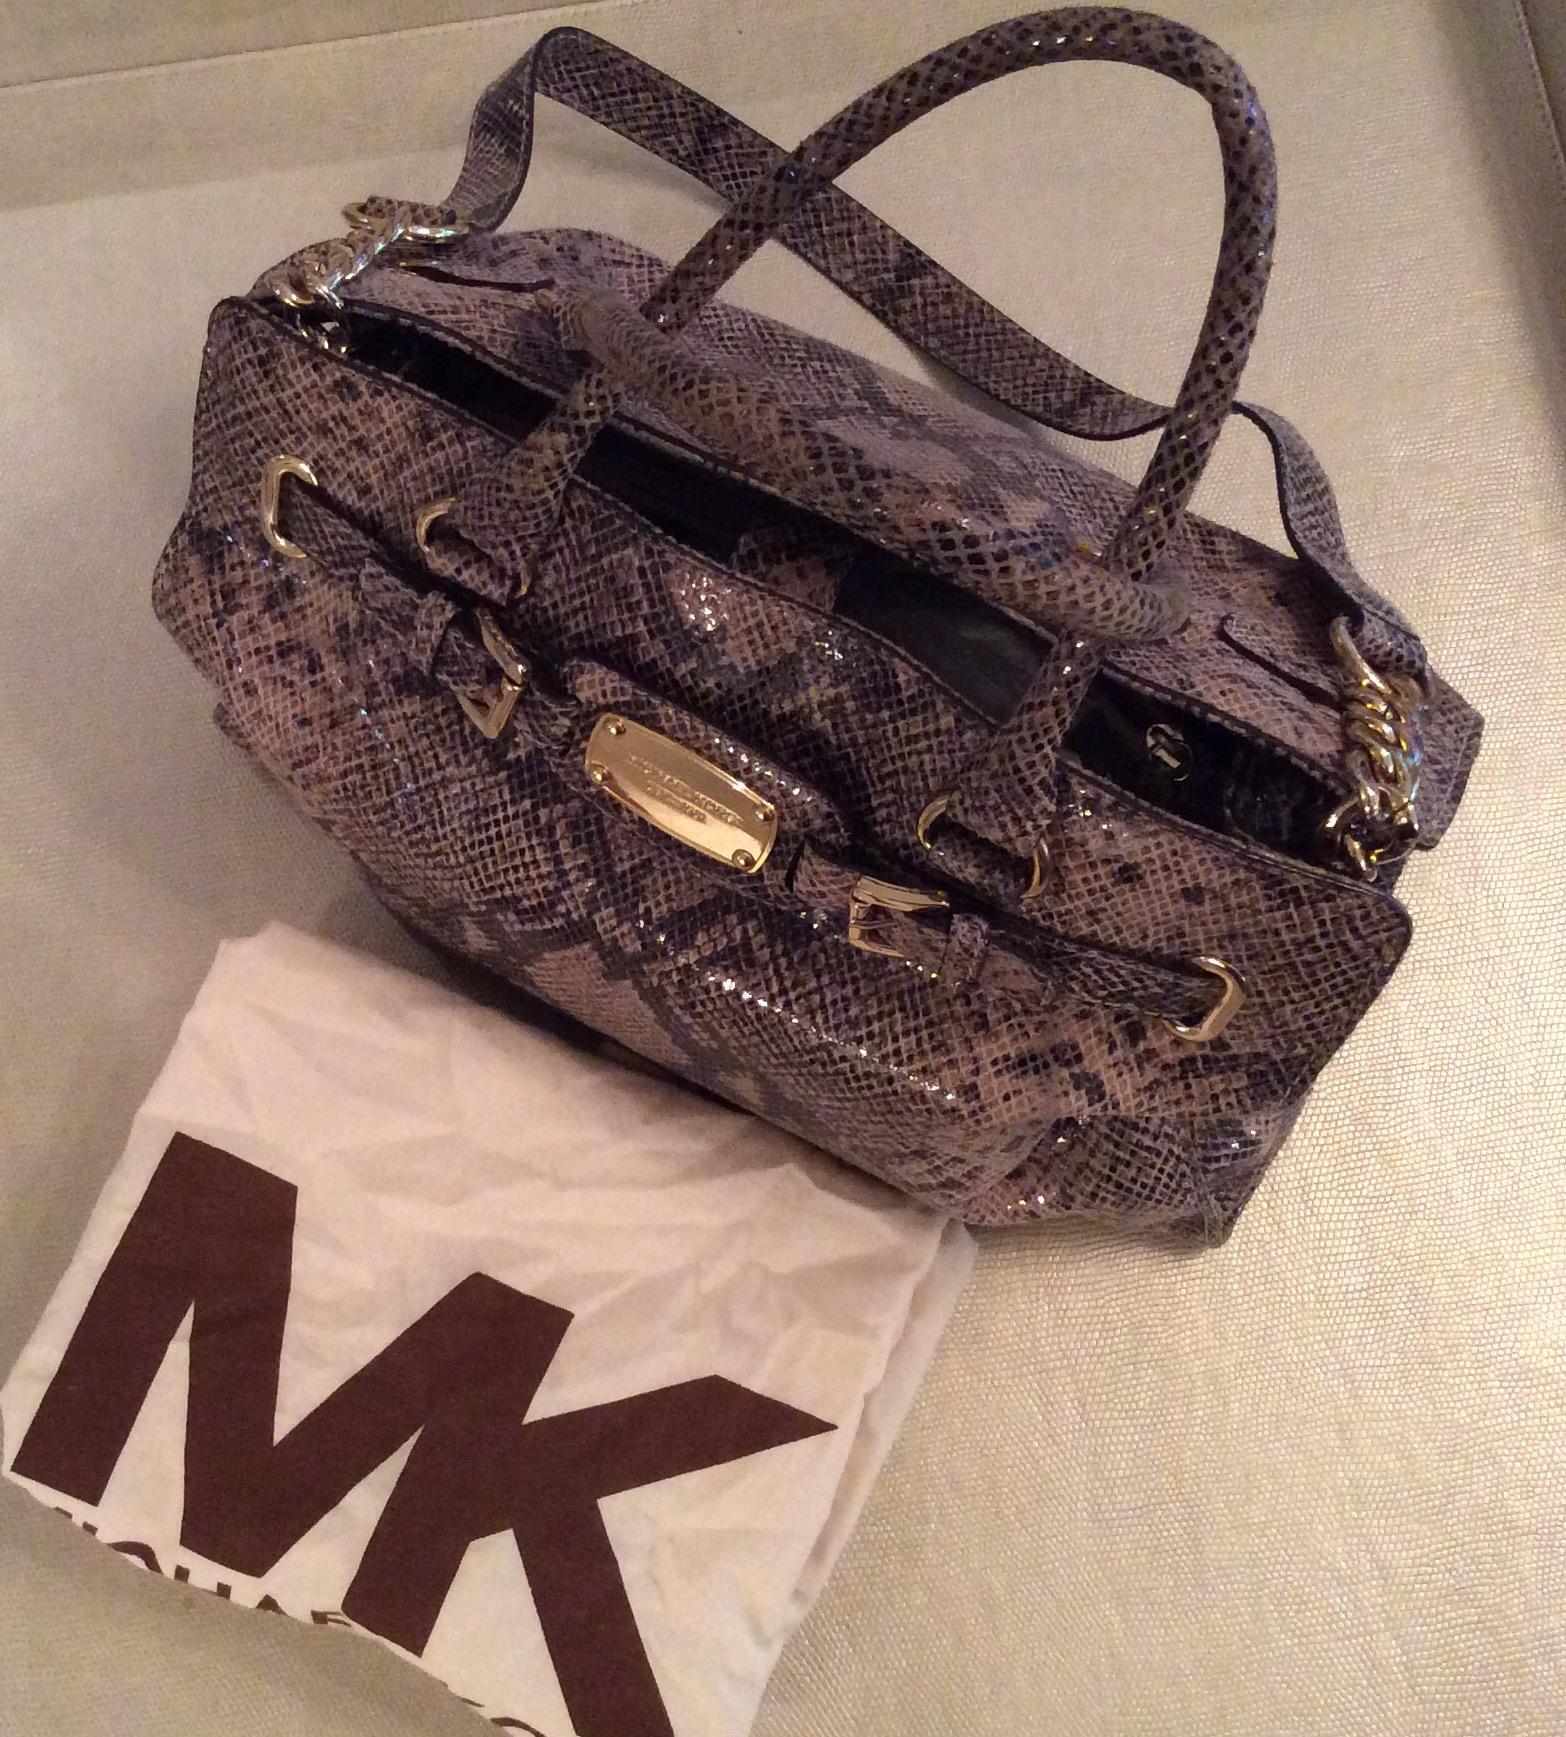 Michael Kors Authentic Large Hamilton Soft Snakeskin Leather Satchel Handbag